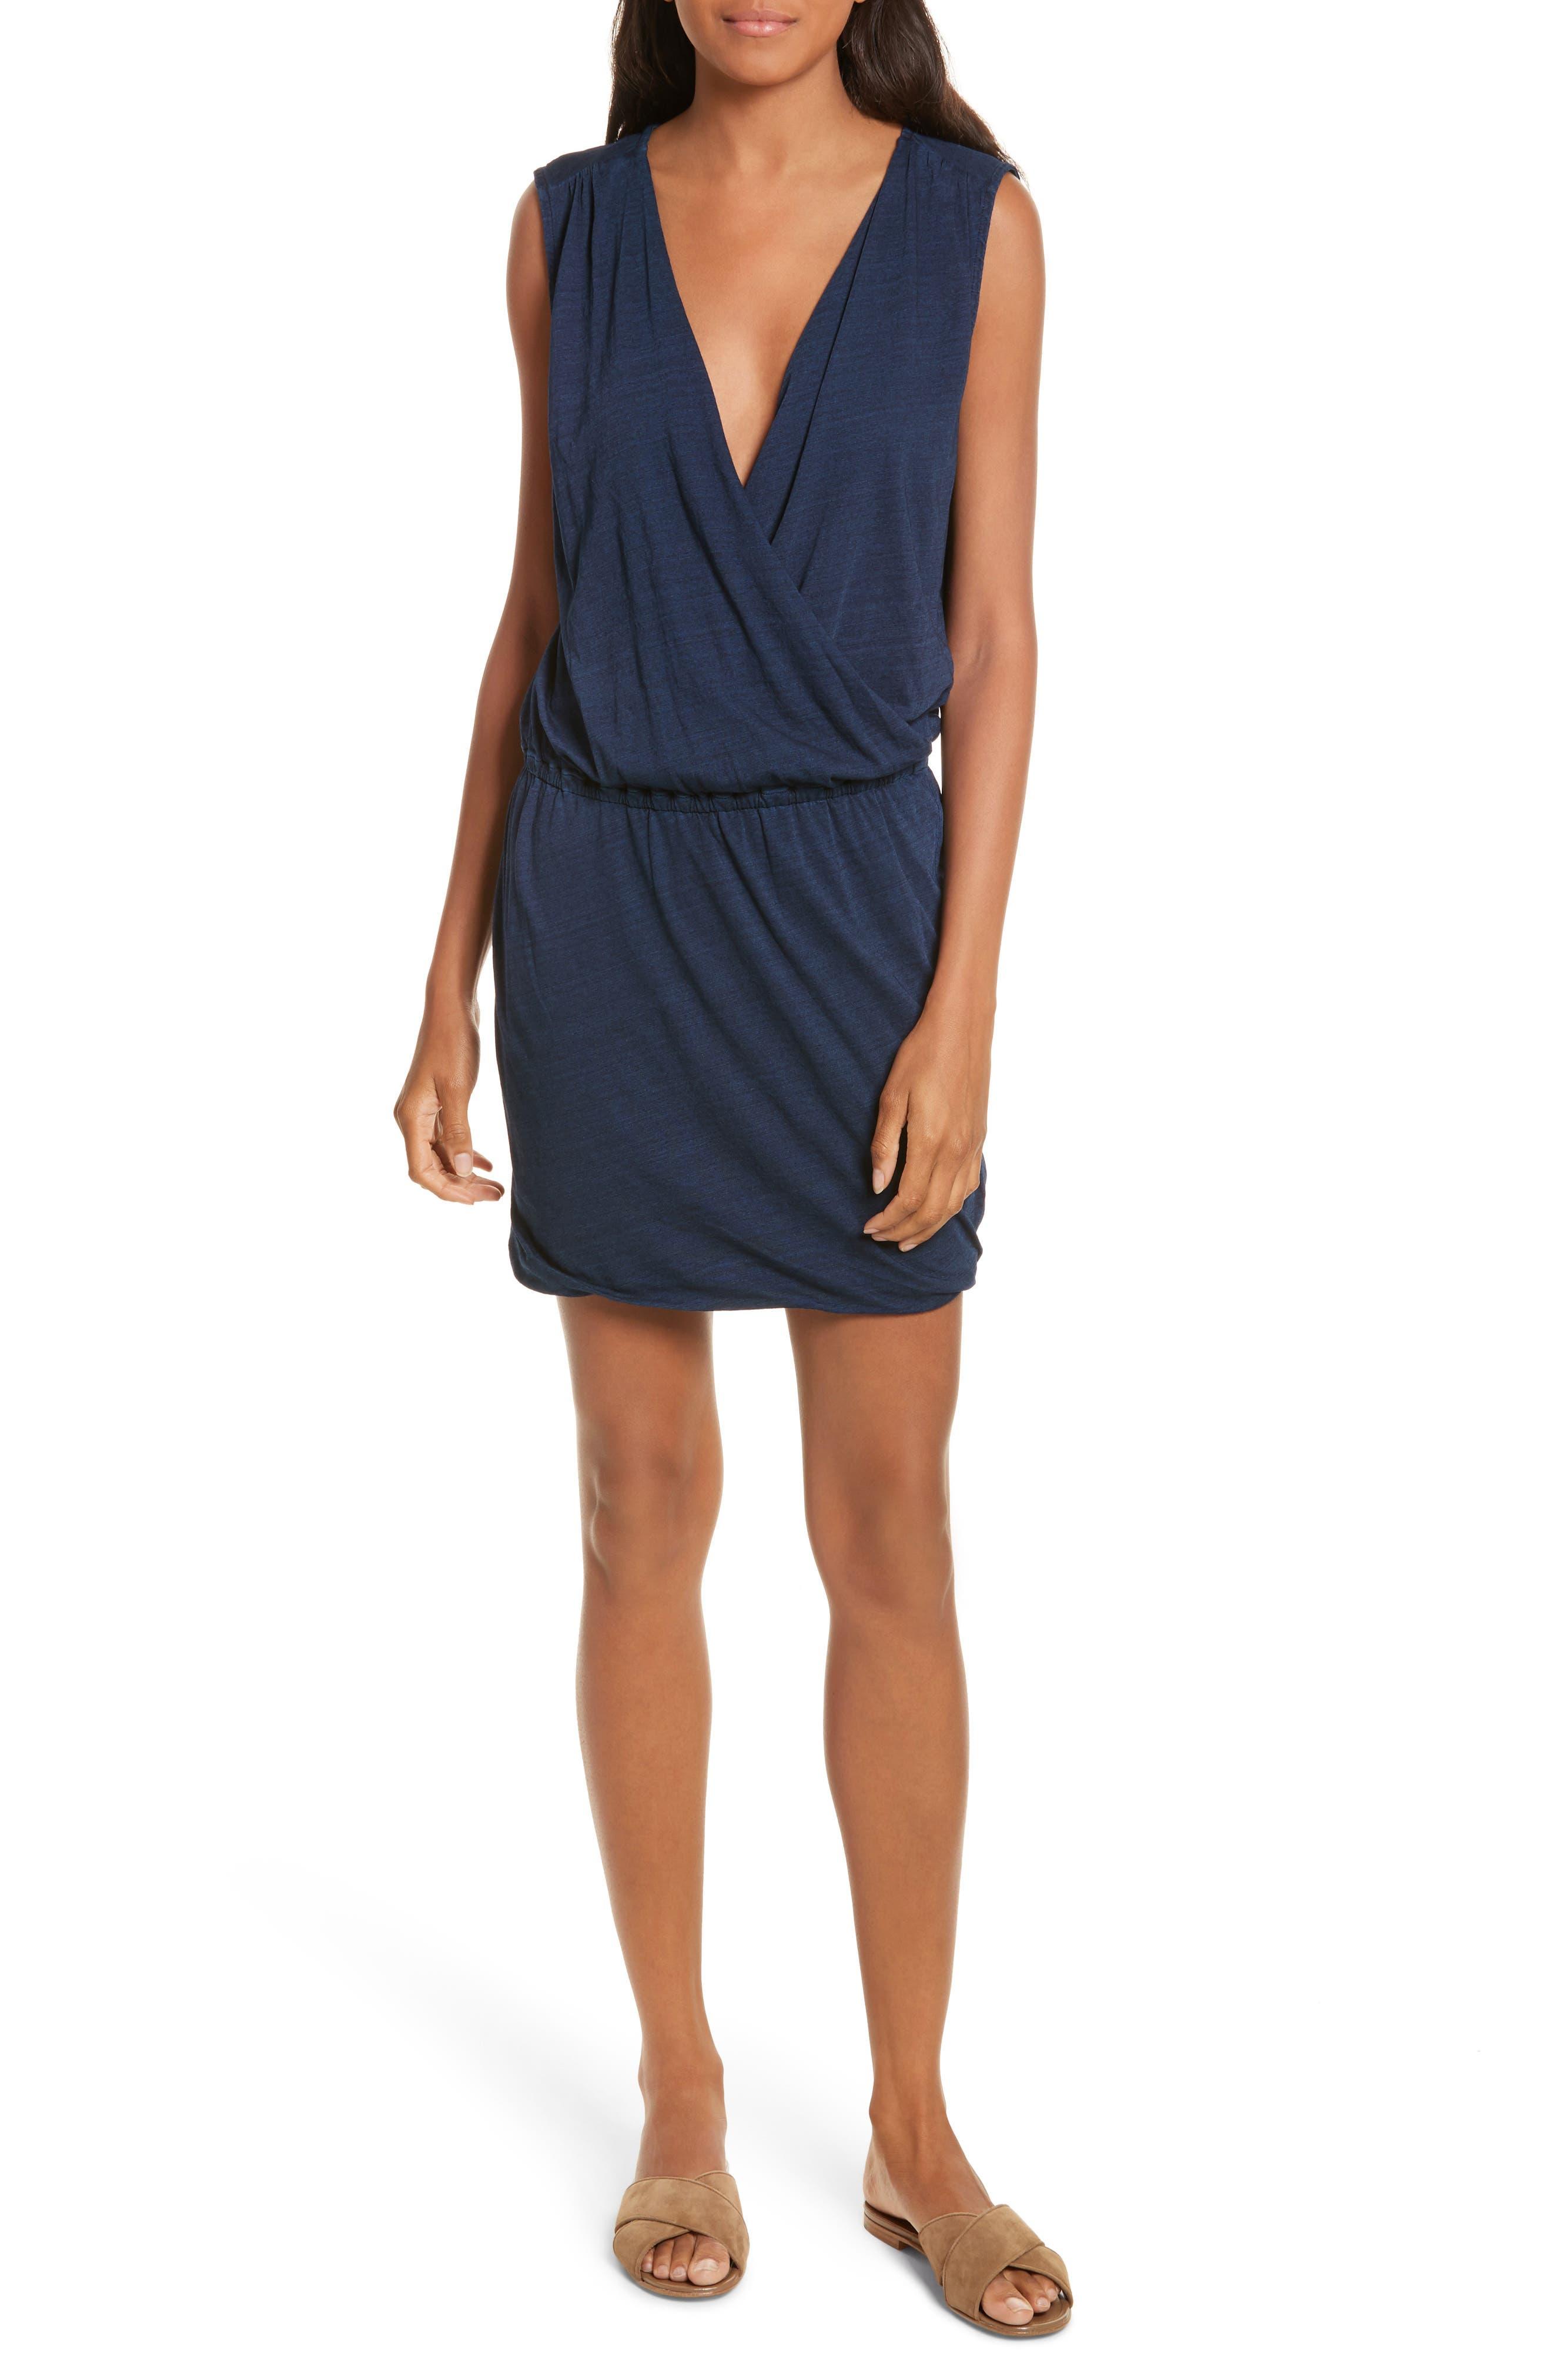 Main Image - Soft Joie Faylen Blouson Knit Dress